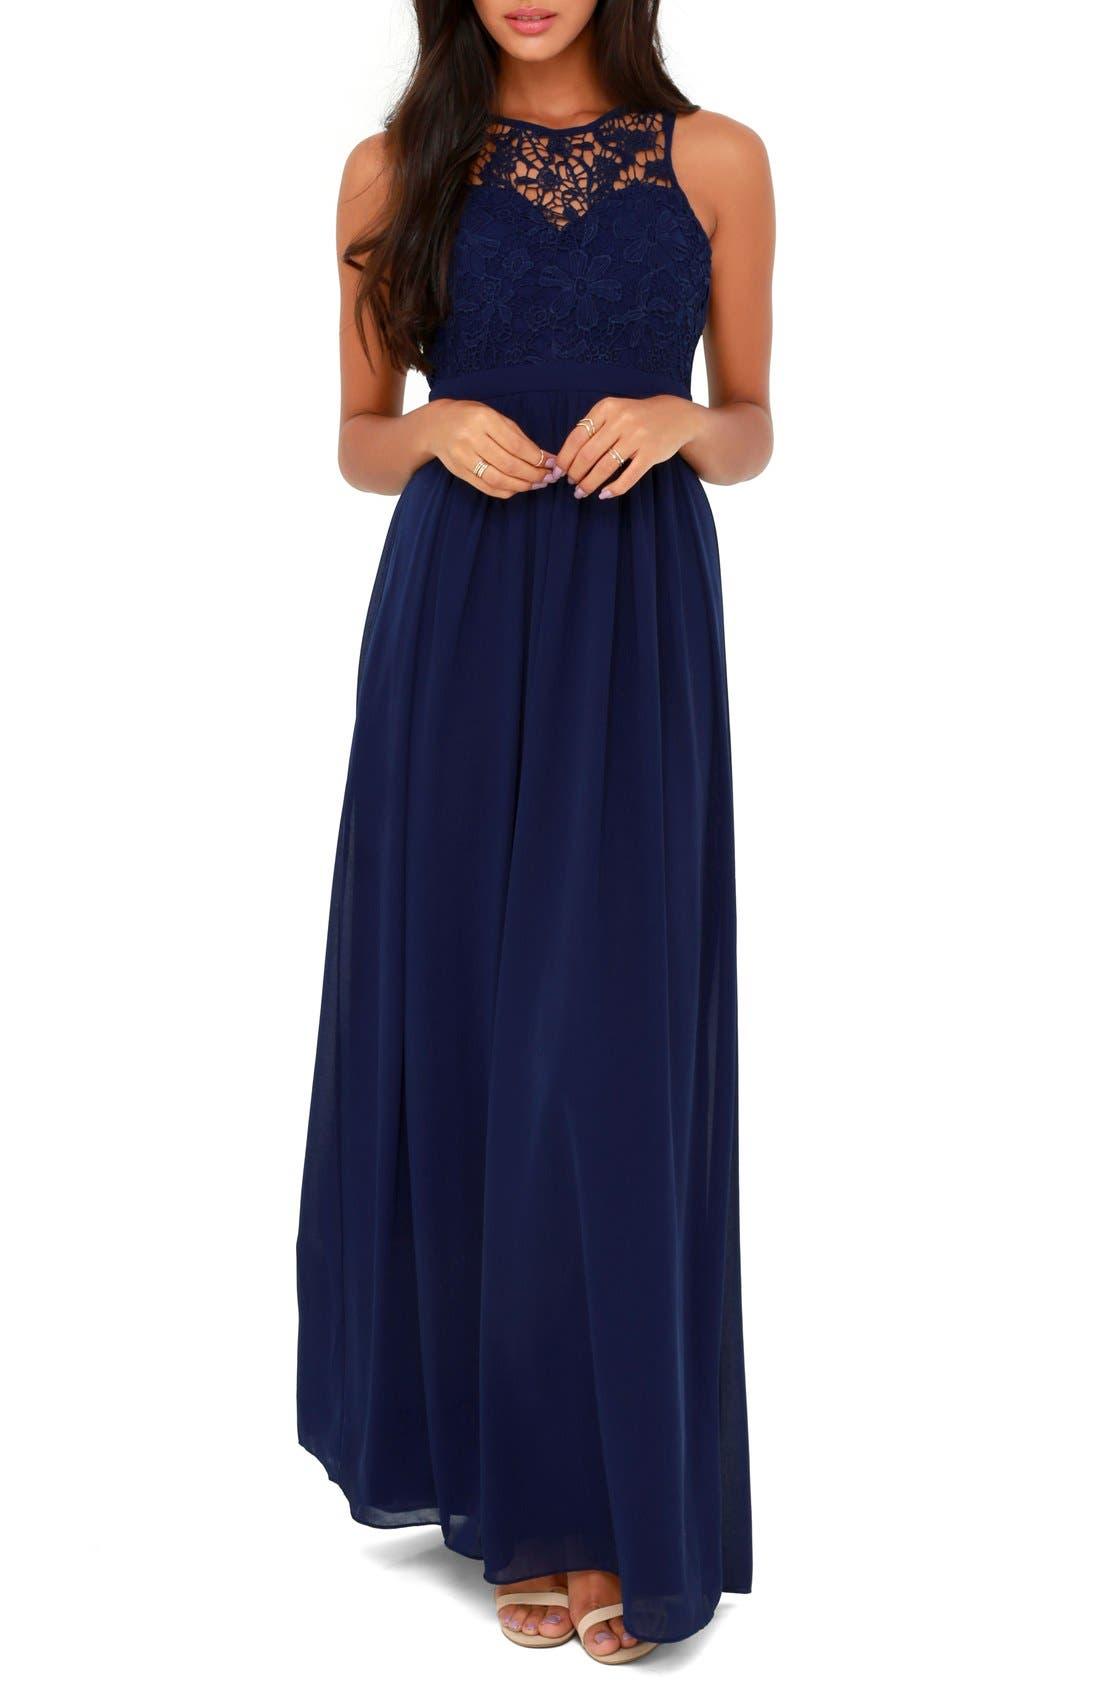 Main Image - Lulus Lace Overlay Sweetheart Chiffon Gown